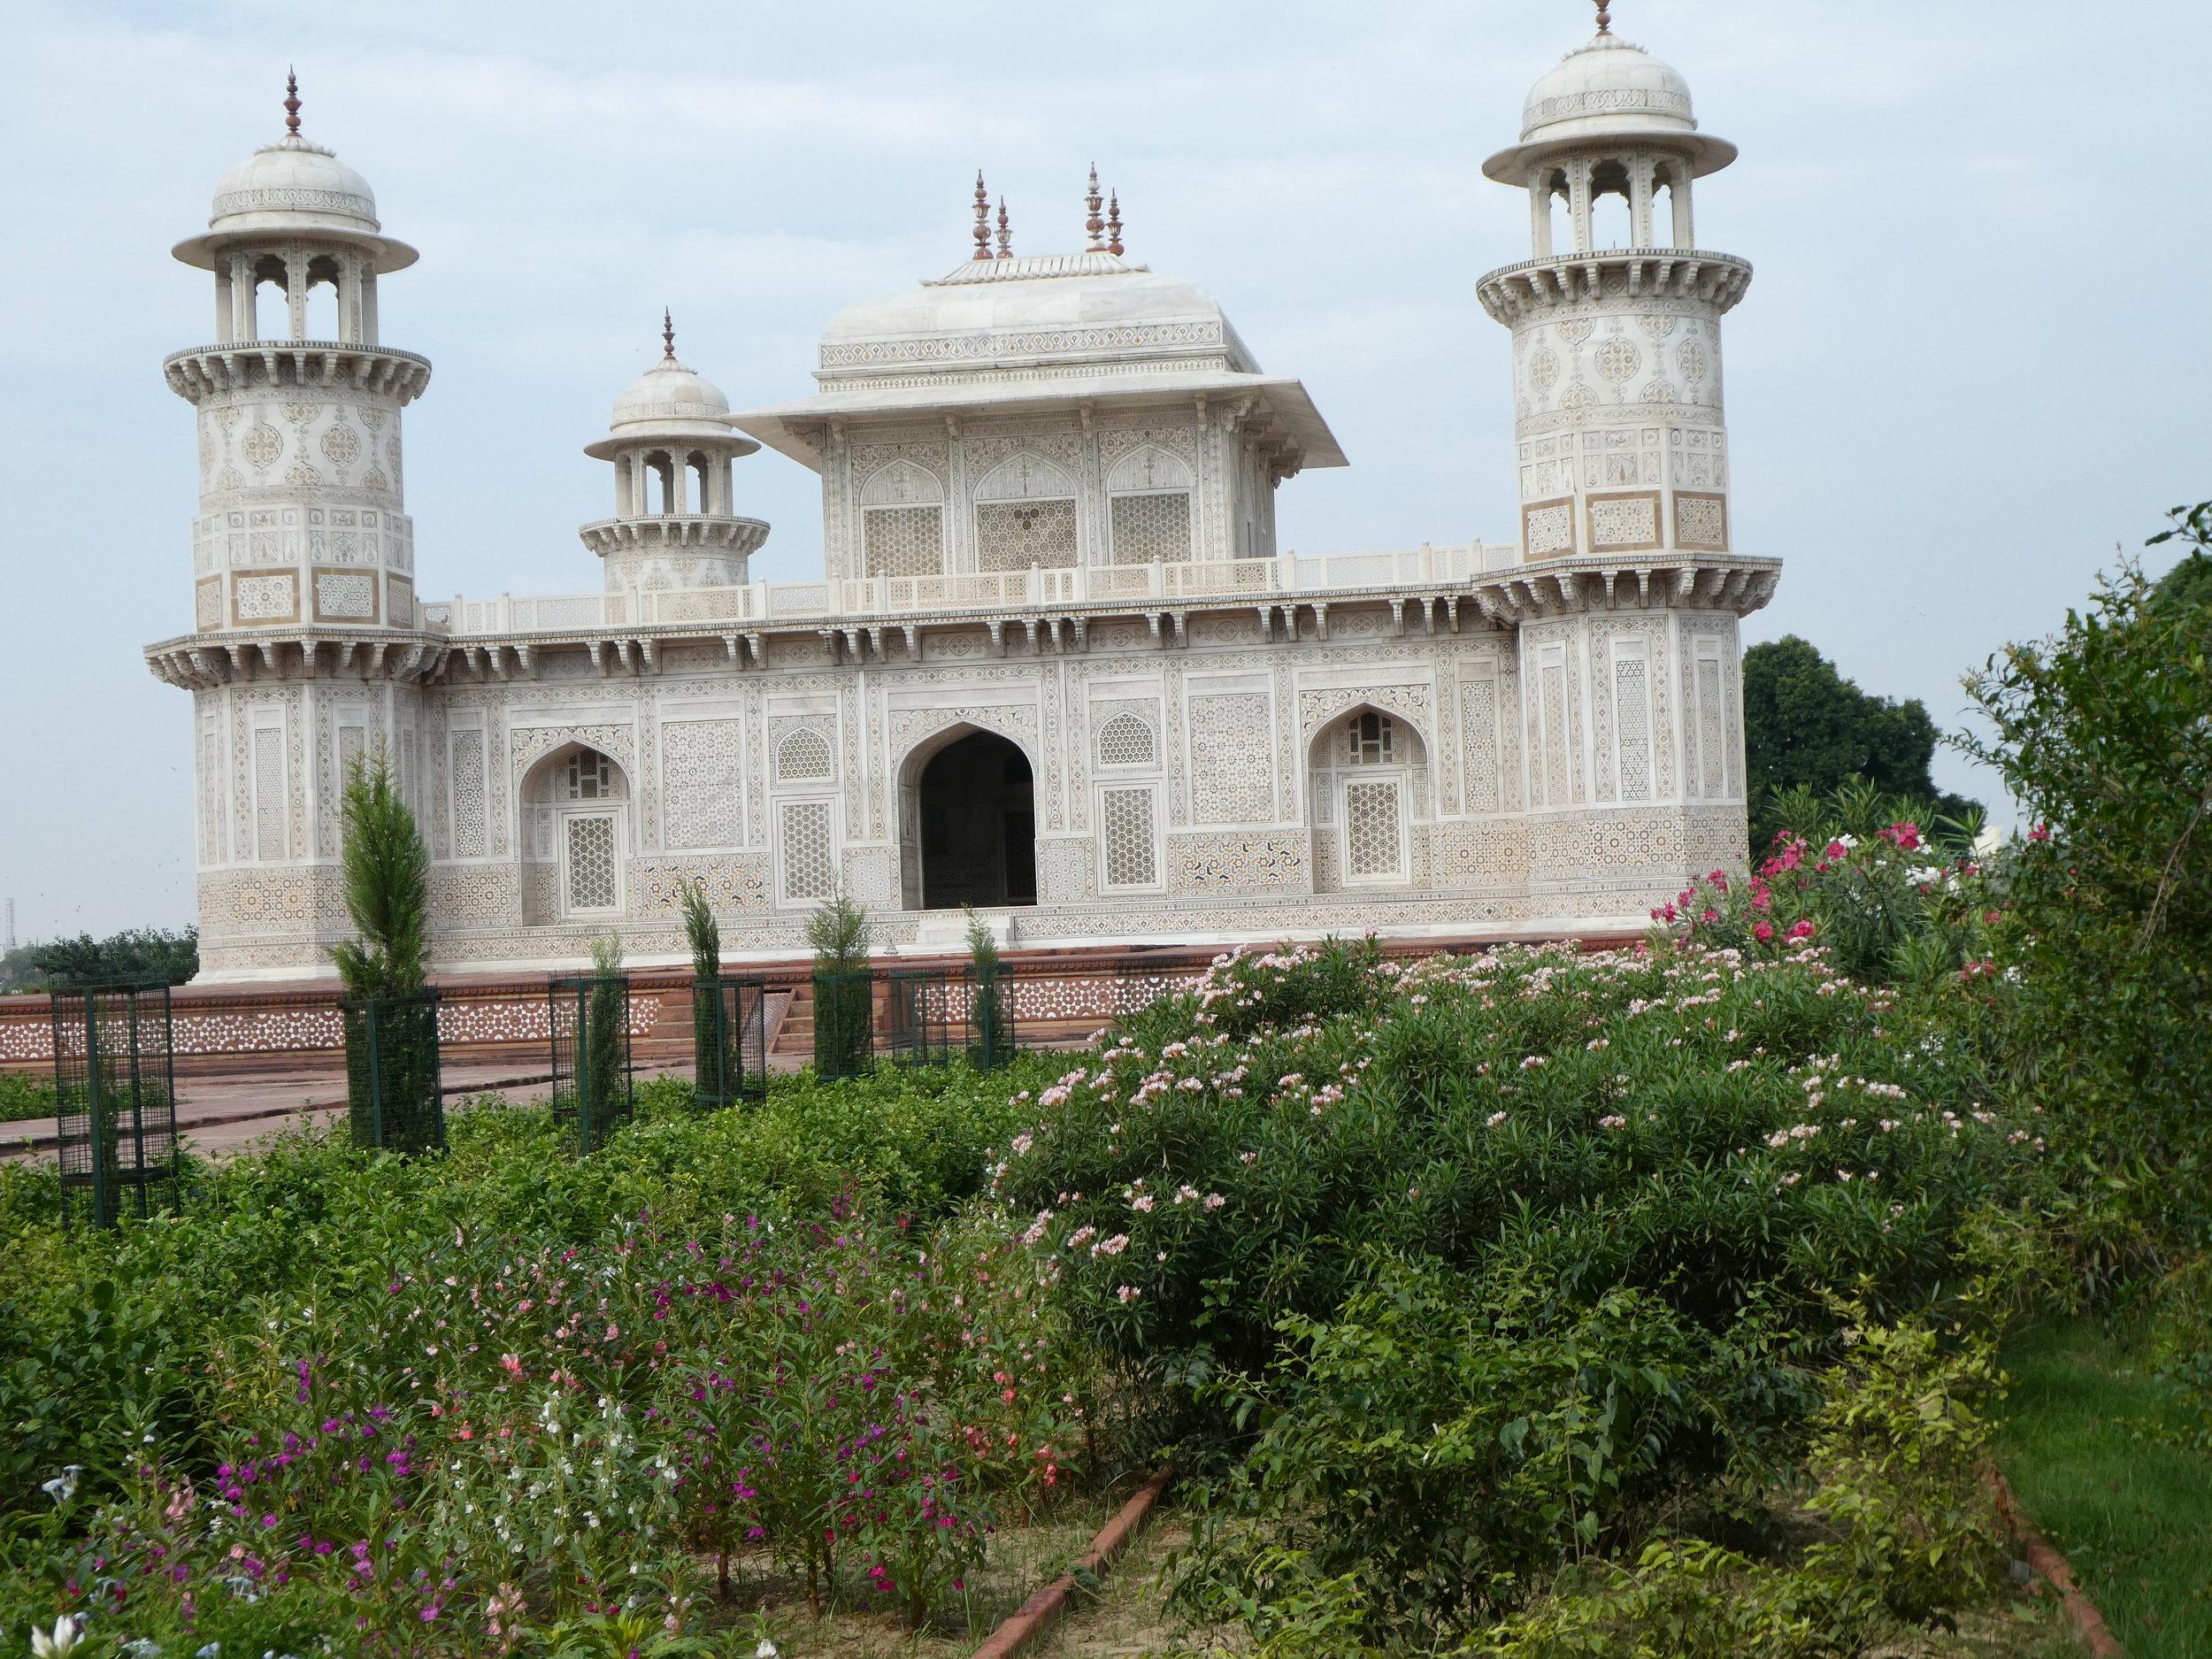 Tomb of I'timād-ud-Daulah, sometimes called the Baby Taj.